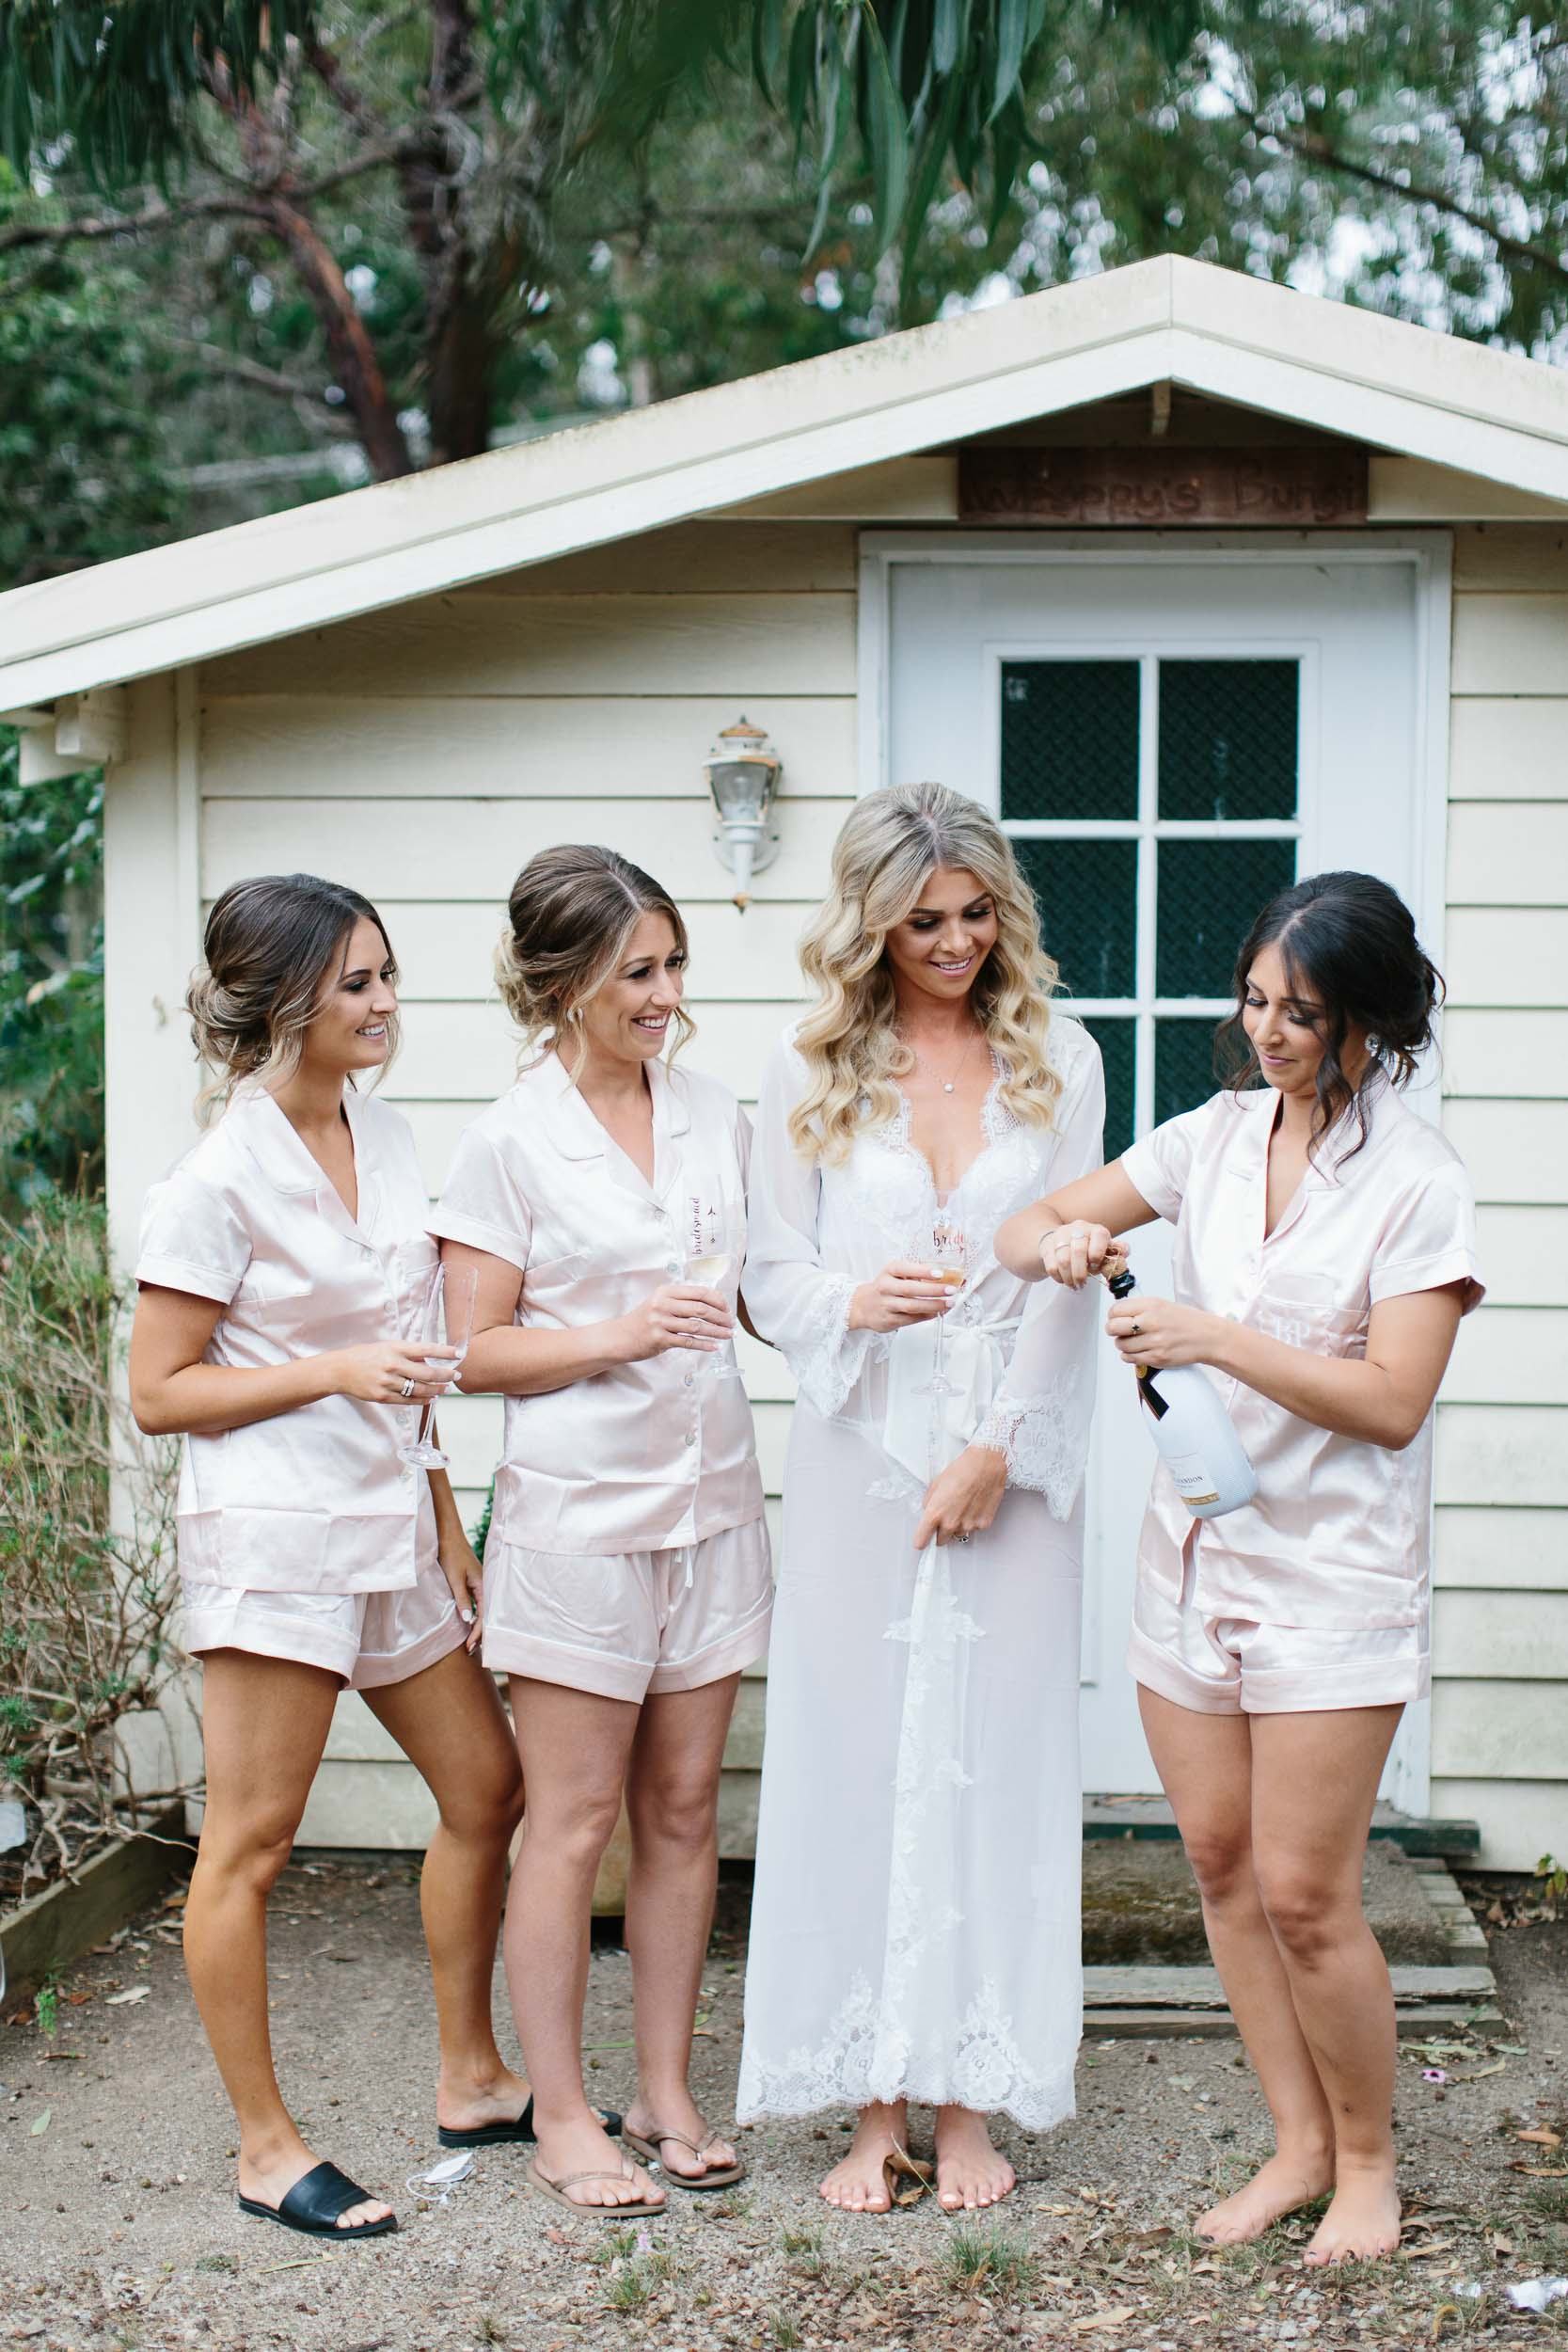 Kas-Richards-Mornington-Peninsula-Private-Property-Wedding-Marianna-Hardwick-Gown-59.jpg